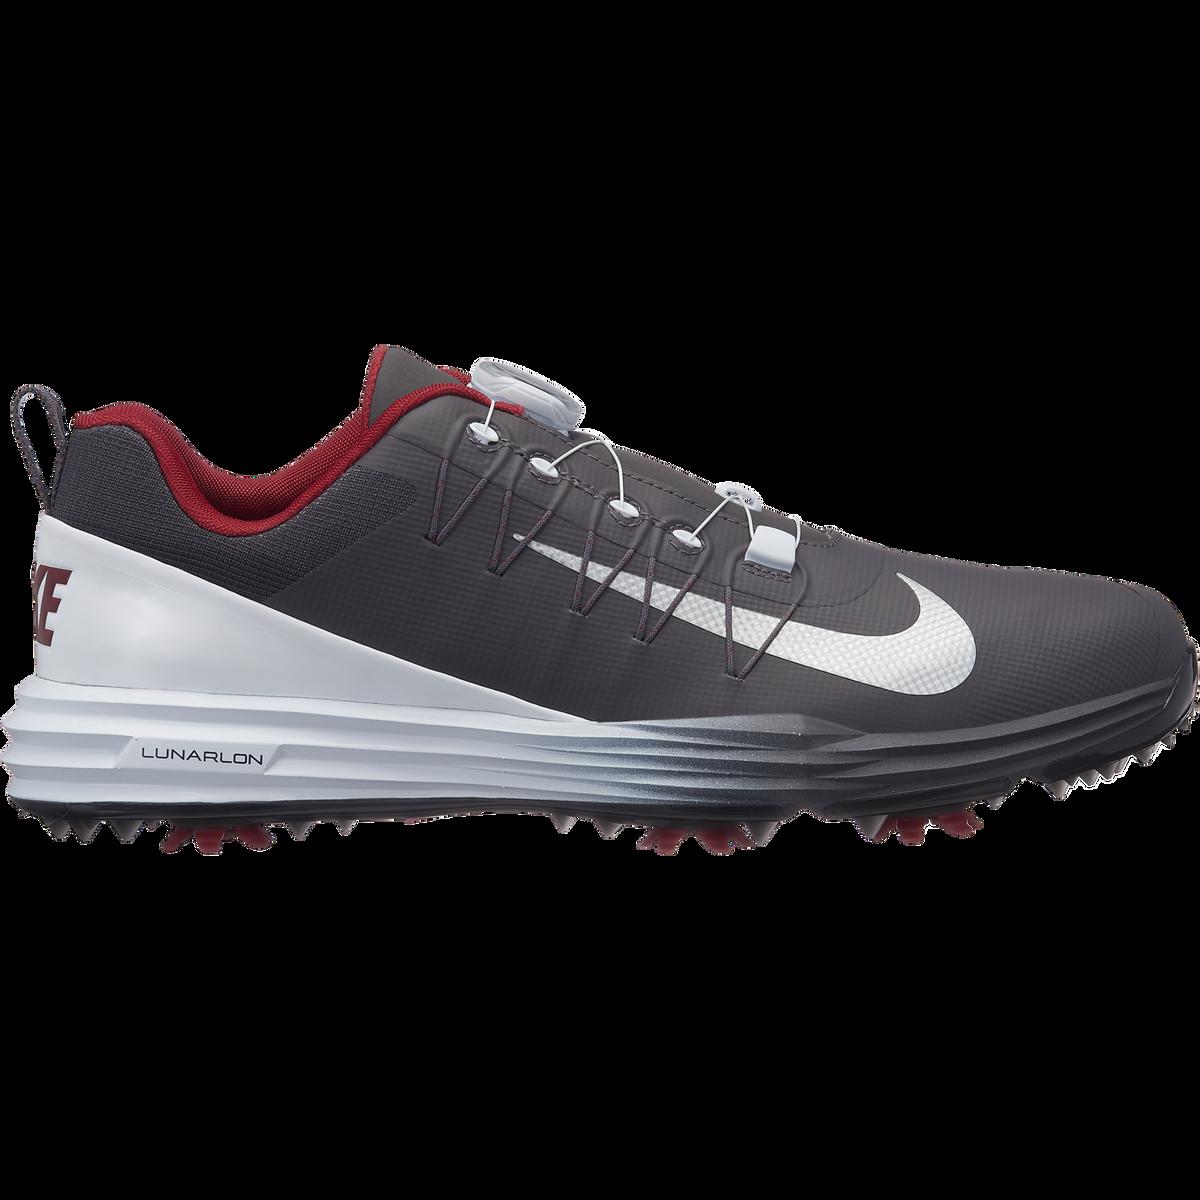 03a9cae504712 Nike Lunar Command 2 BOA Men s Golf Shoe - Grey White